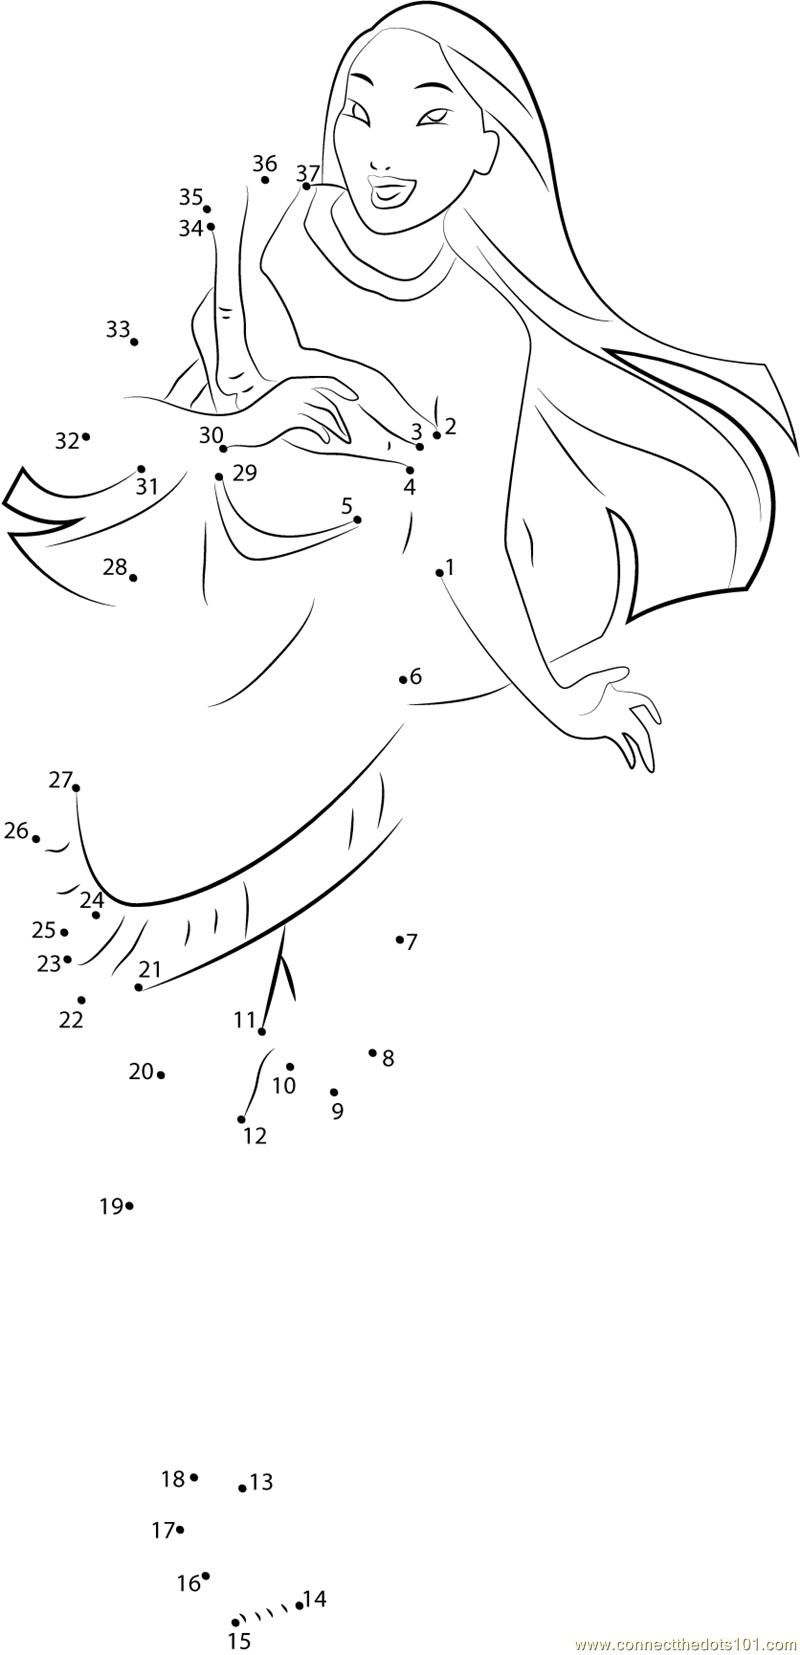 Princess Pocahontas dot to dot printable worksheet - Connect The Dots